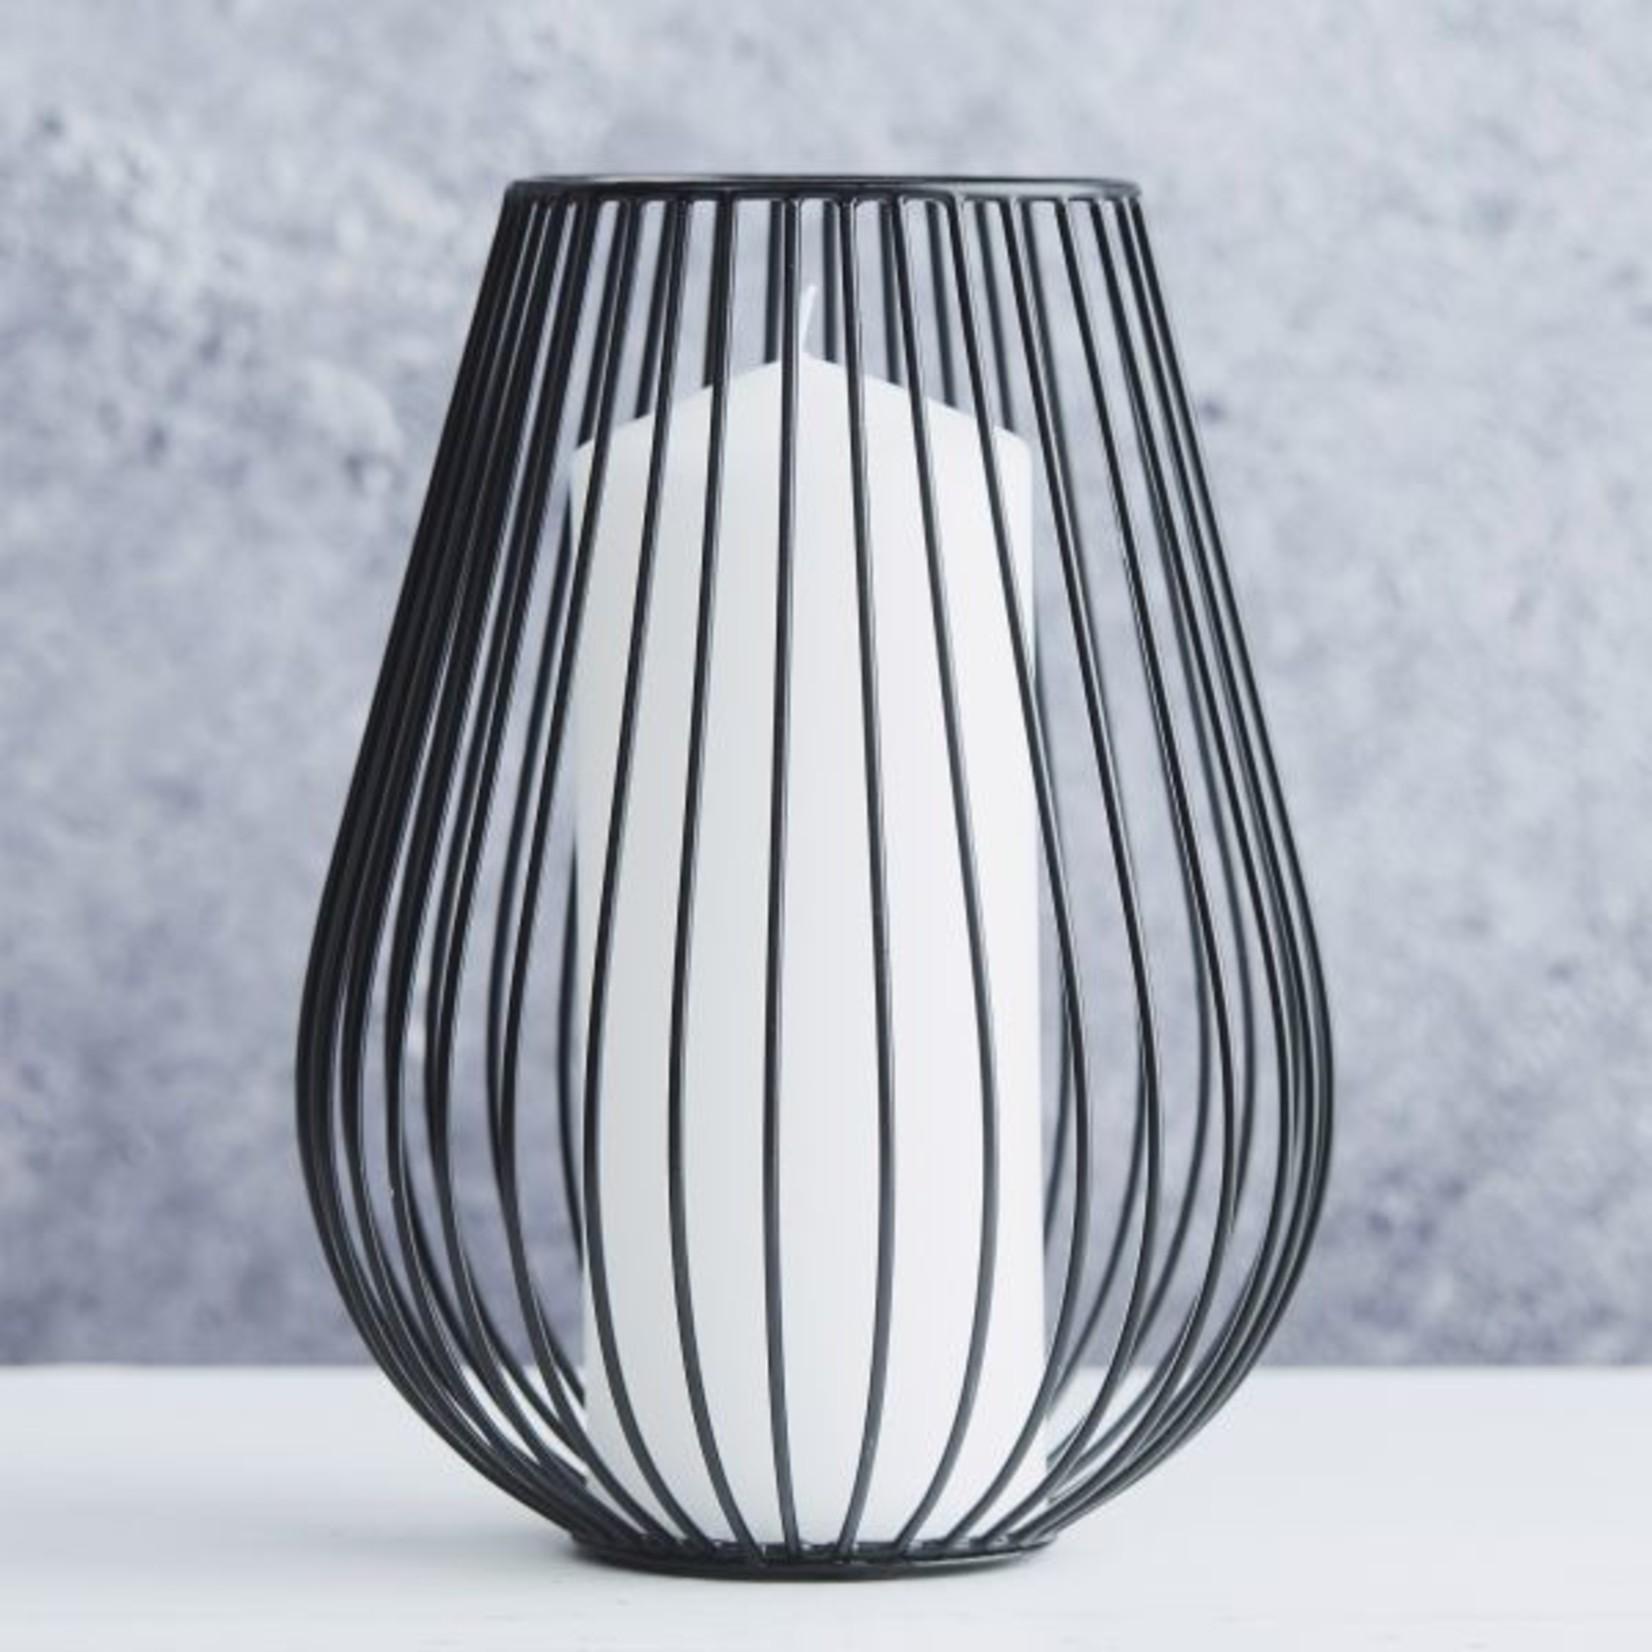 Point Virgule Kaarshouder - Wire - Zwart - Ø 17cm x 22,5cm